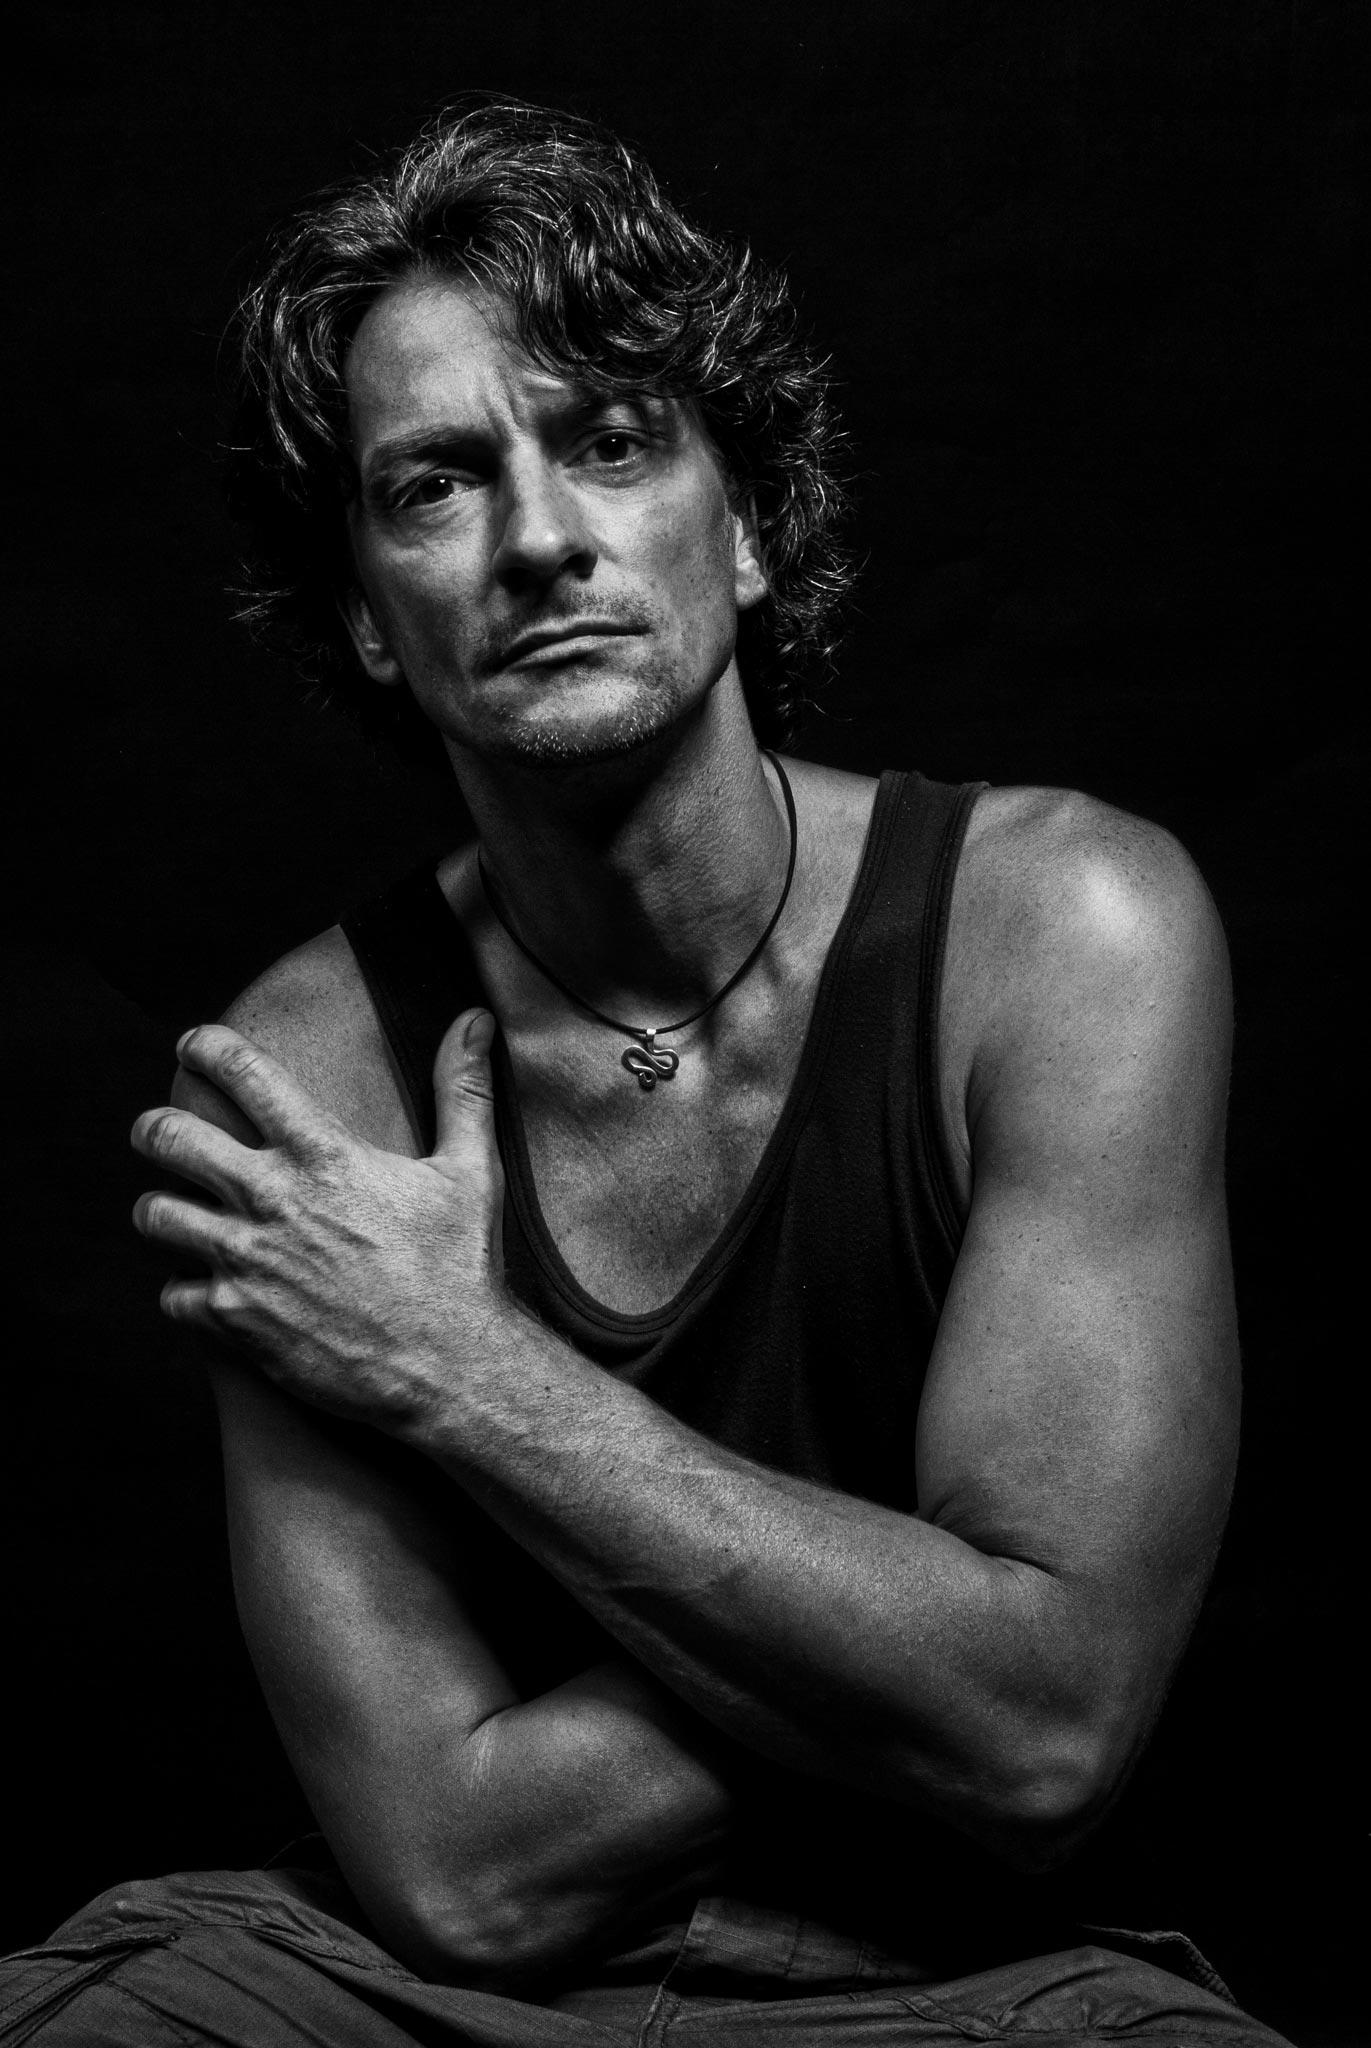 yacobs_portrait-studio-photography_ingmar-koglin